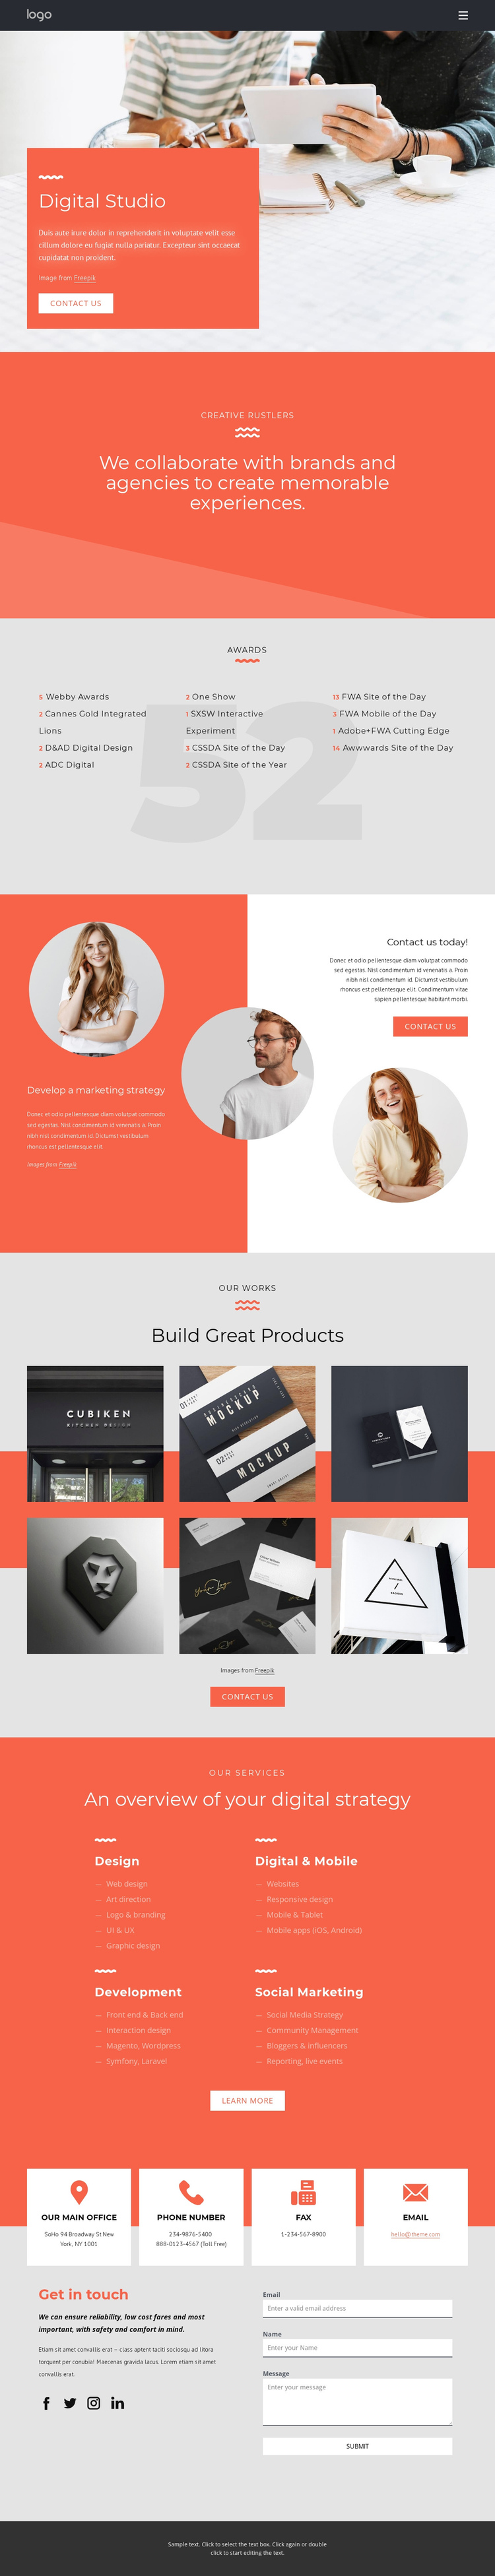 We create memorable experiences Website Builder Software